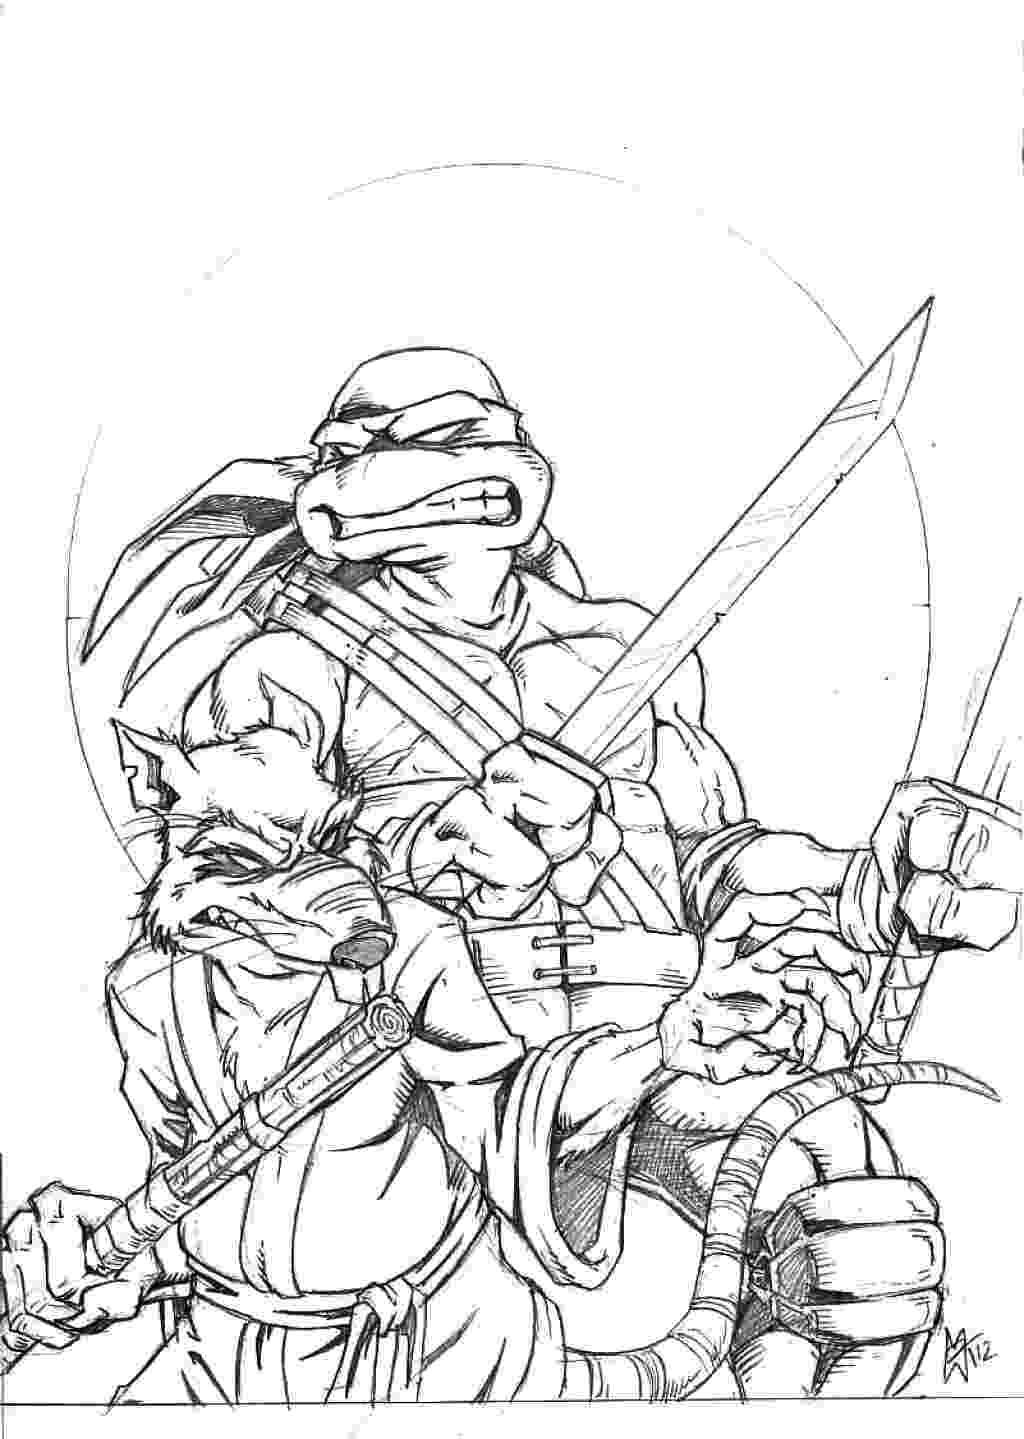 coloring book pages teenage mutant ninja turtles kleurplaat ninja turtles masker krijg duizenden book mutant ninja teenage coloring turtles pages